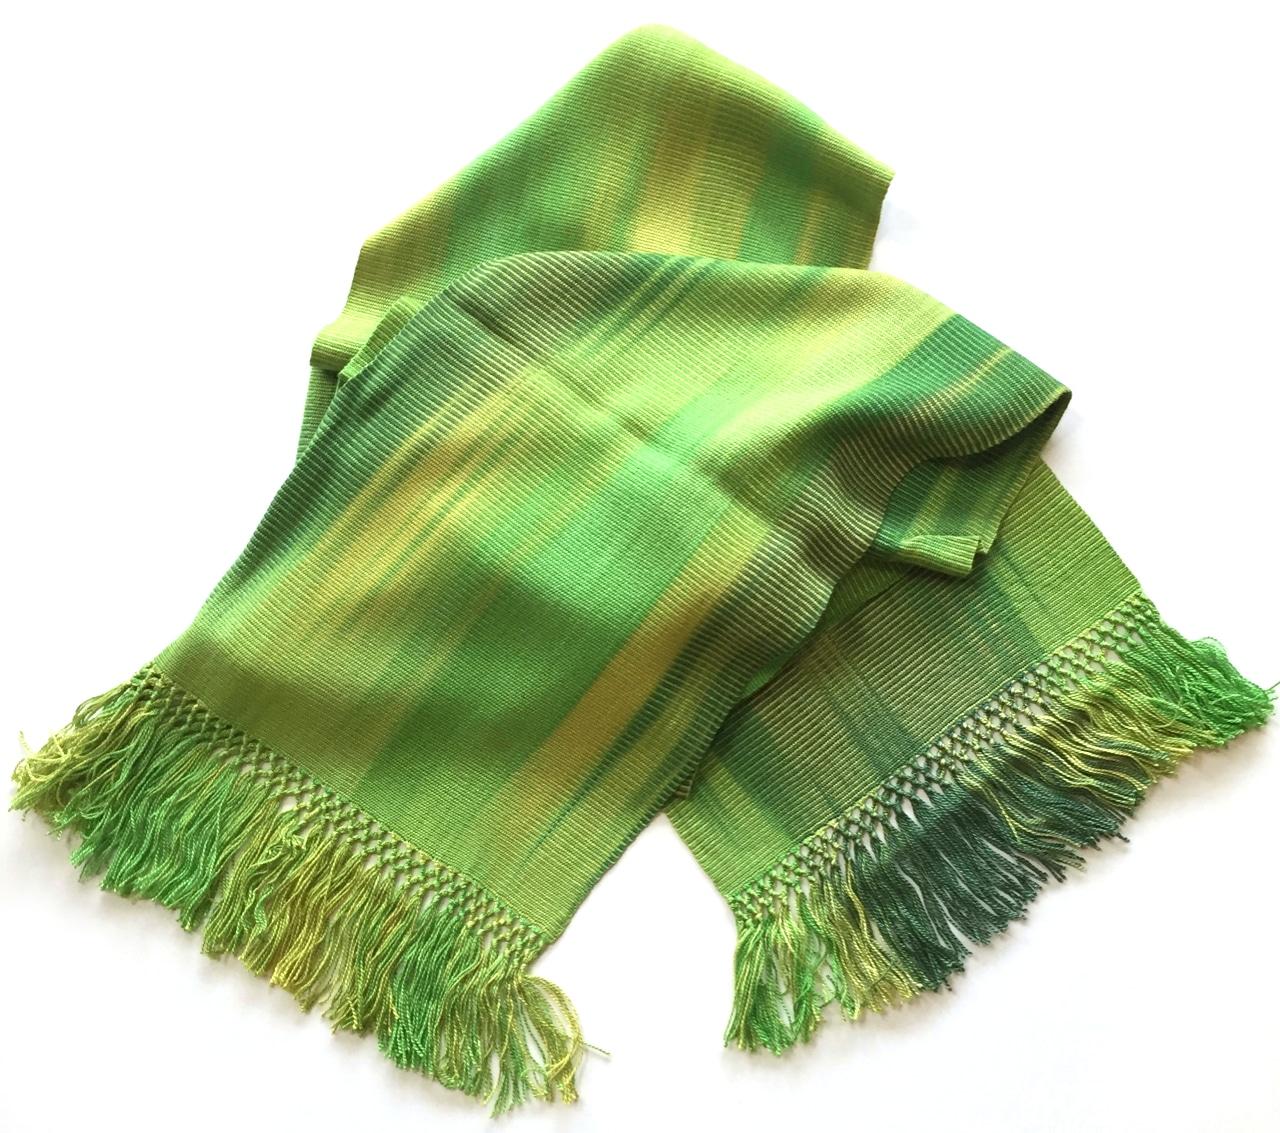 Lime Greens - Lightweight Bamboo Handwoven Scarf 8 x 68